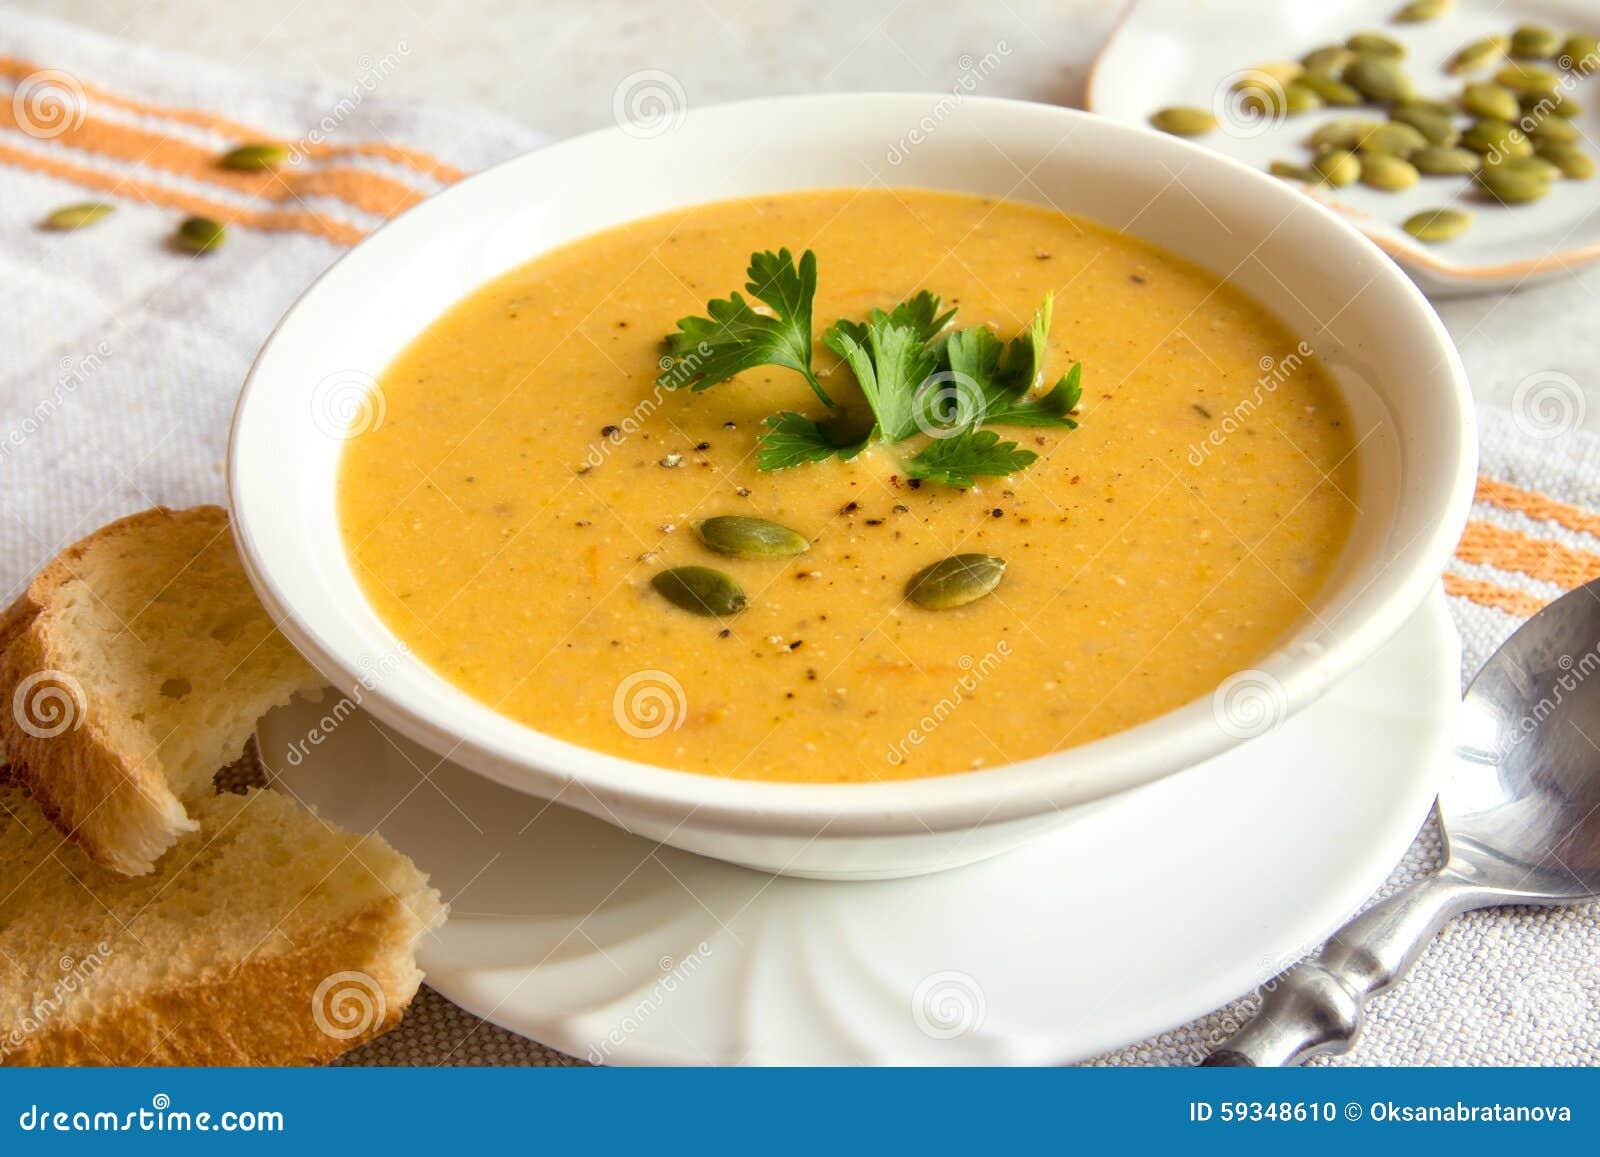 Soupe crème à potiron